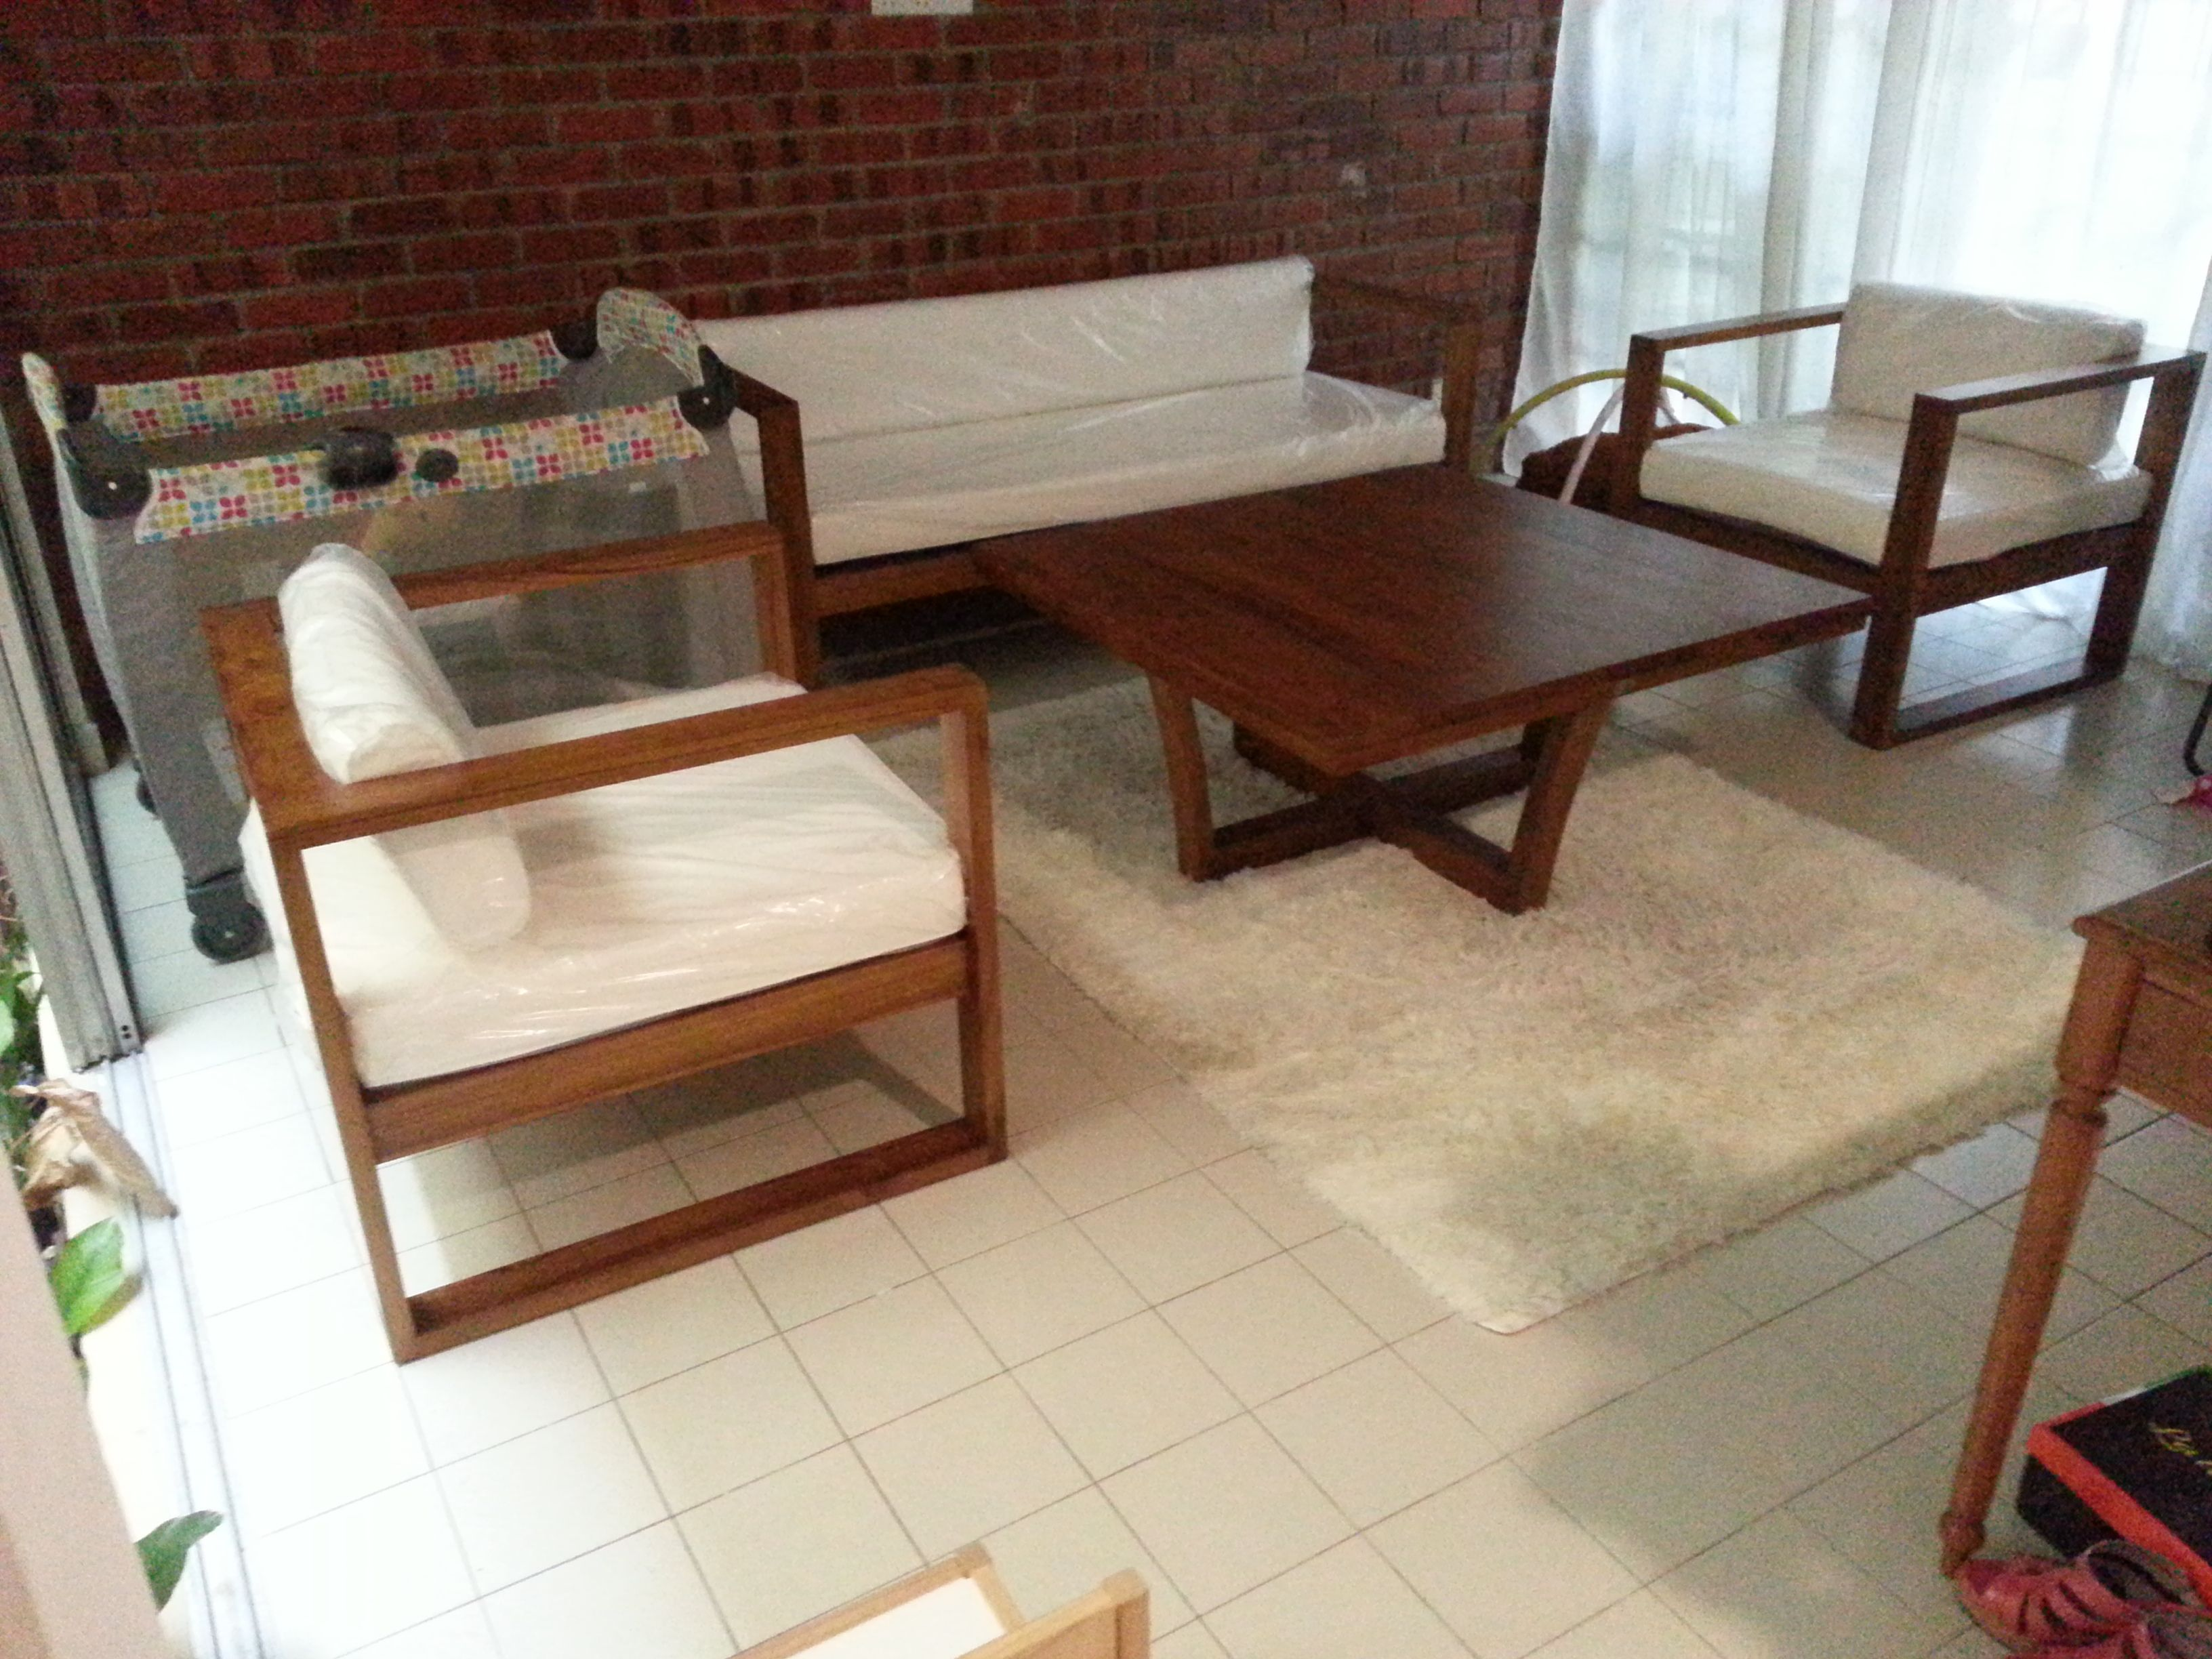 Teak Furniture Malaysia Teak Wood Furniture Shop Selangor Malaysia Herramientas